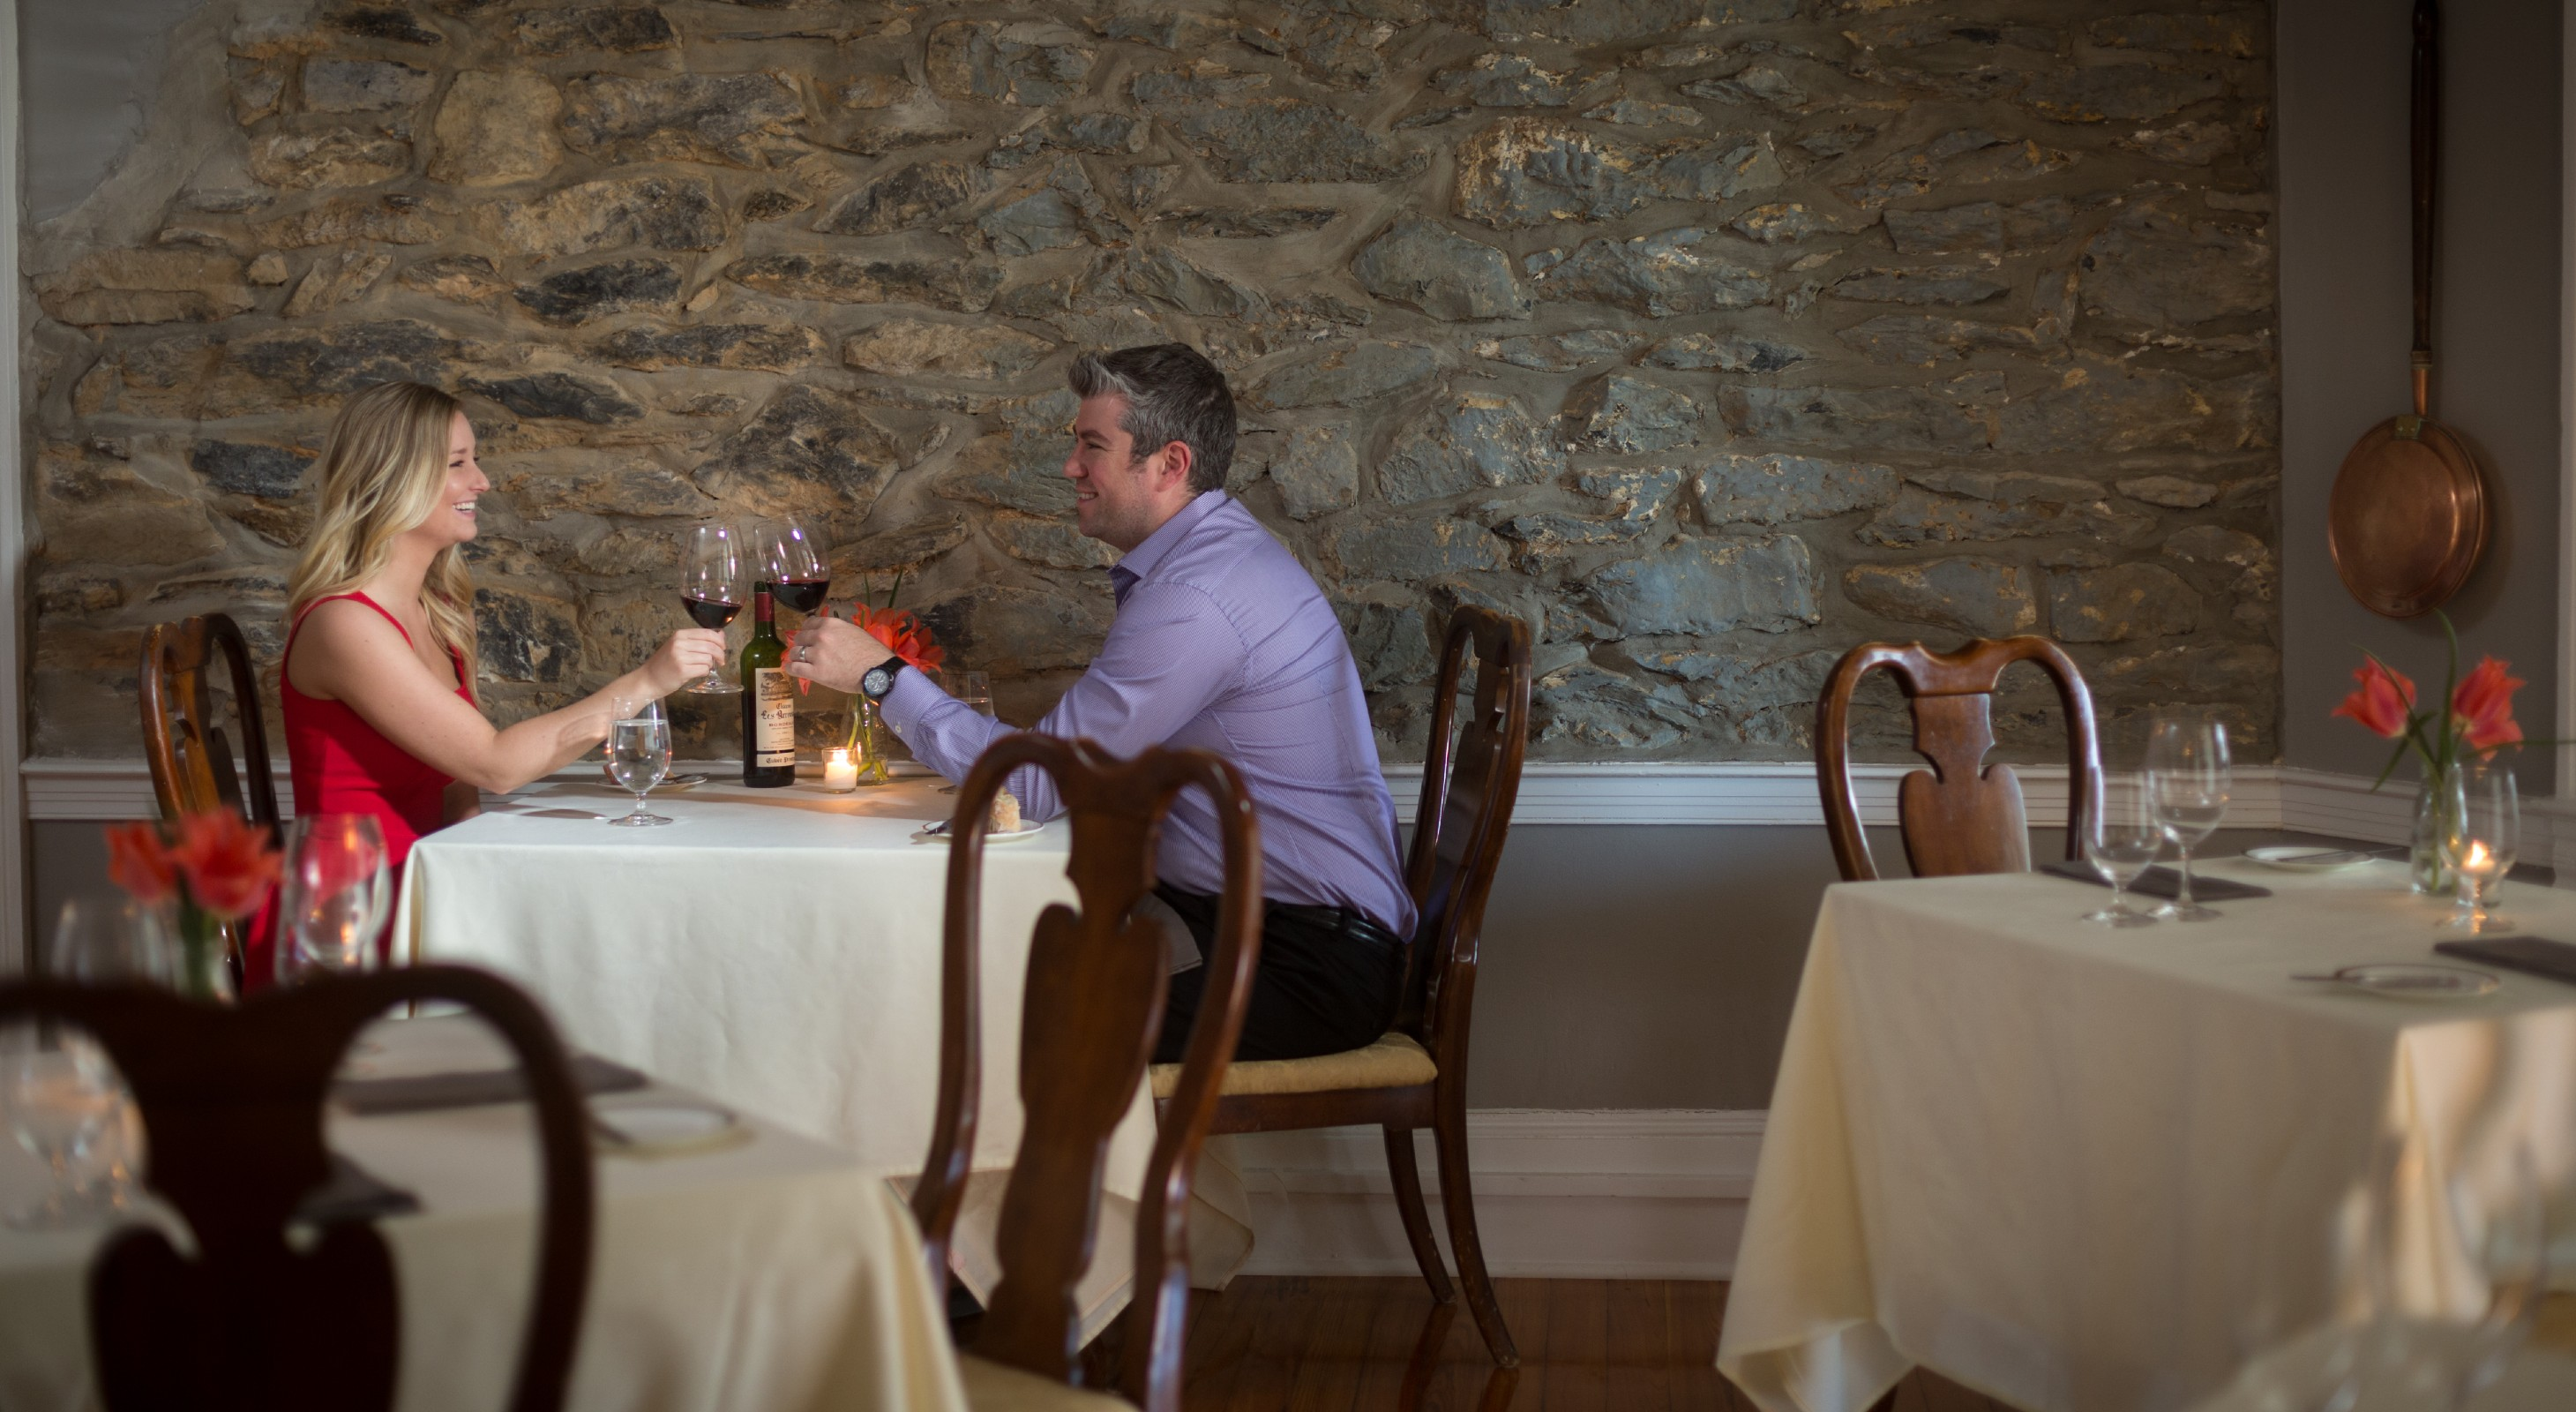 Couple enjoying romantic dinner at L'Auberge Provençale